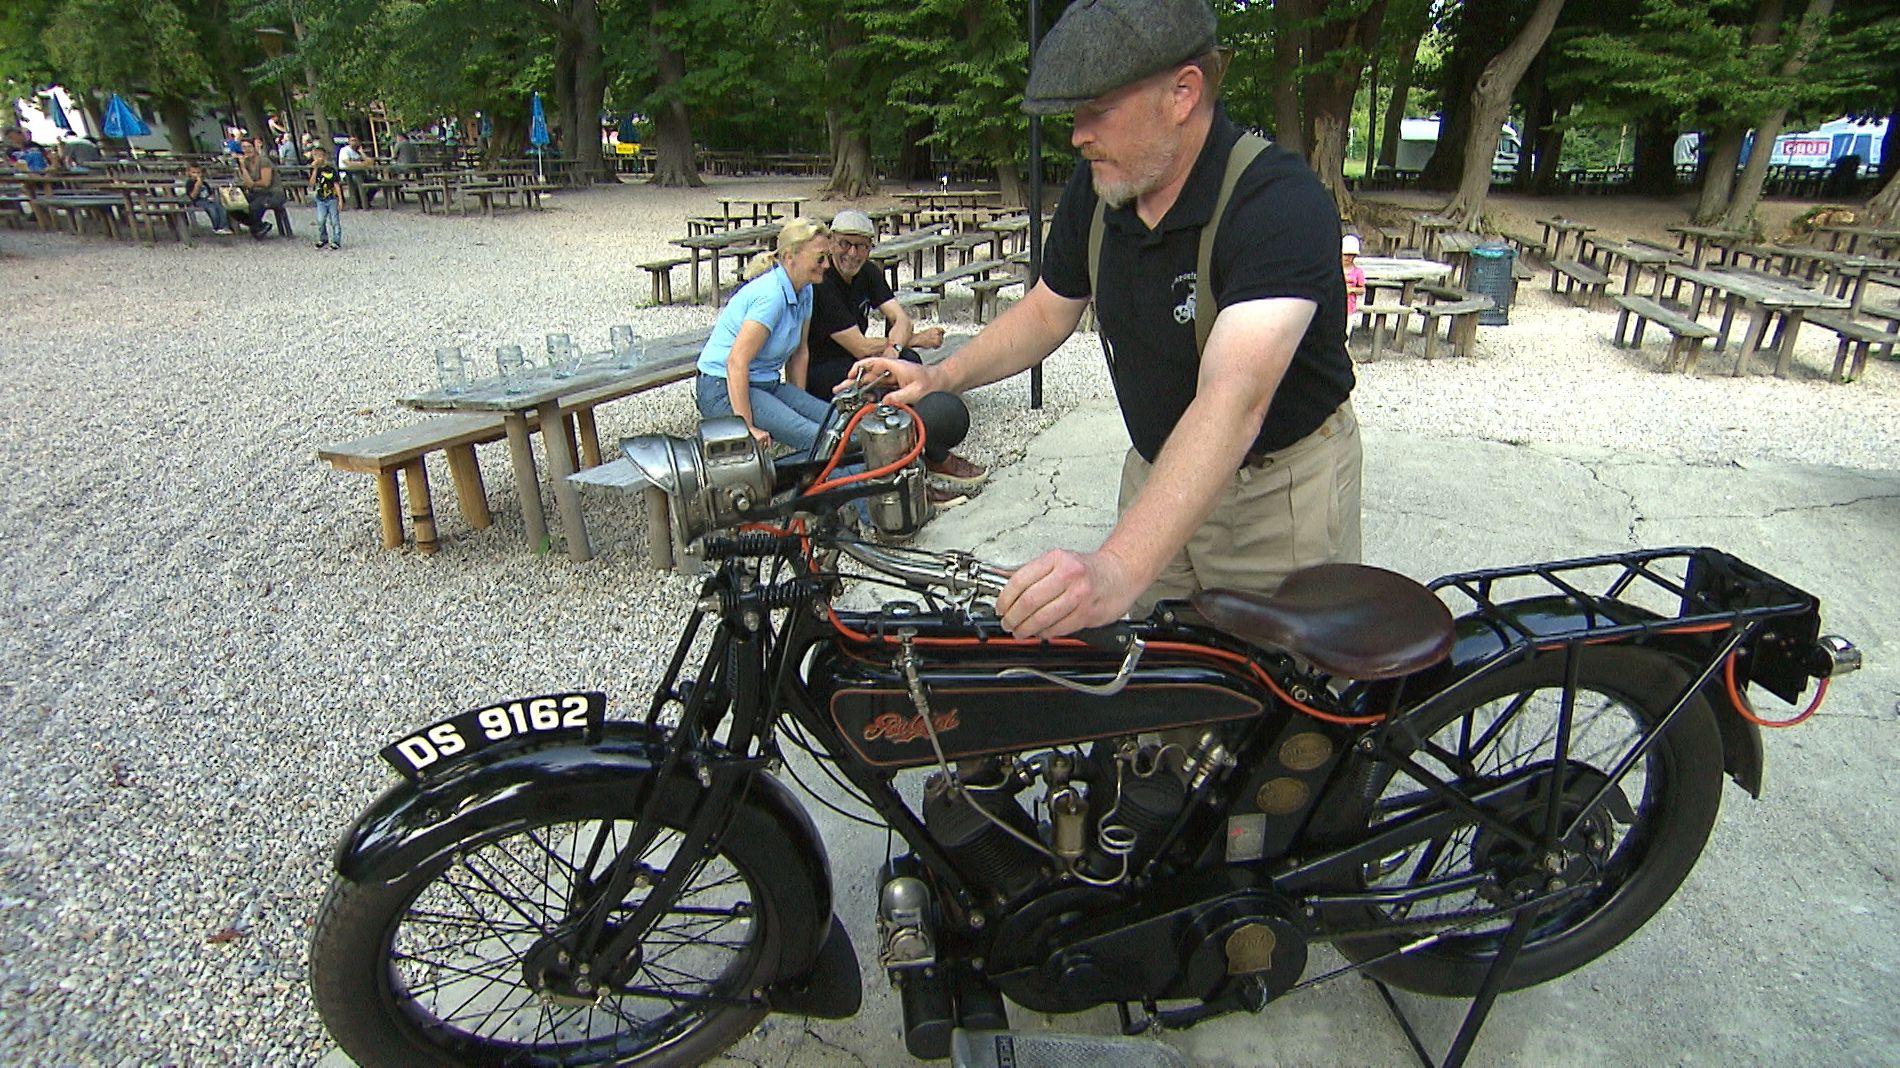 Ein Oldtimer-Motorrad